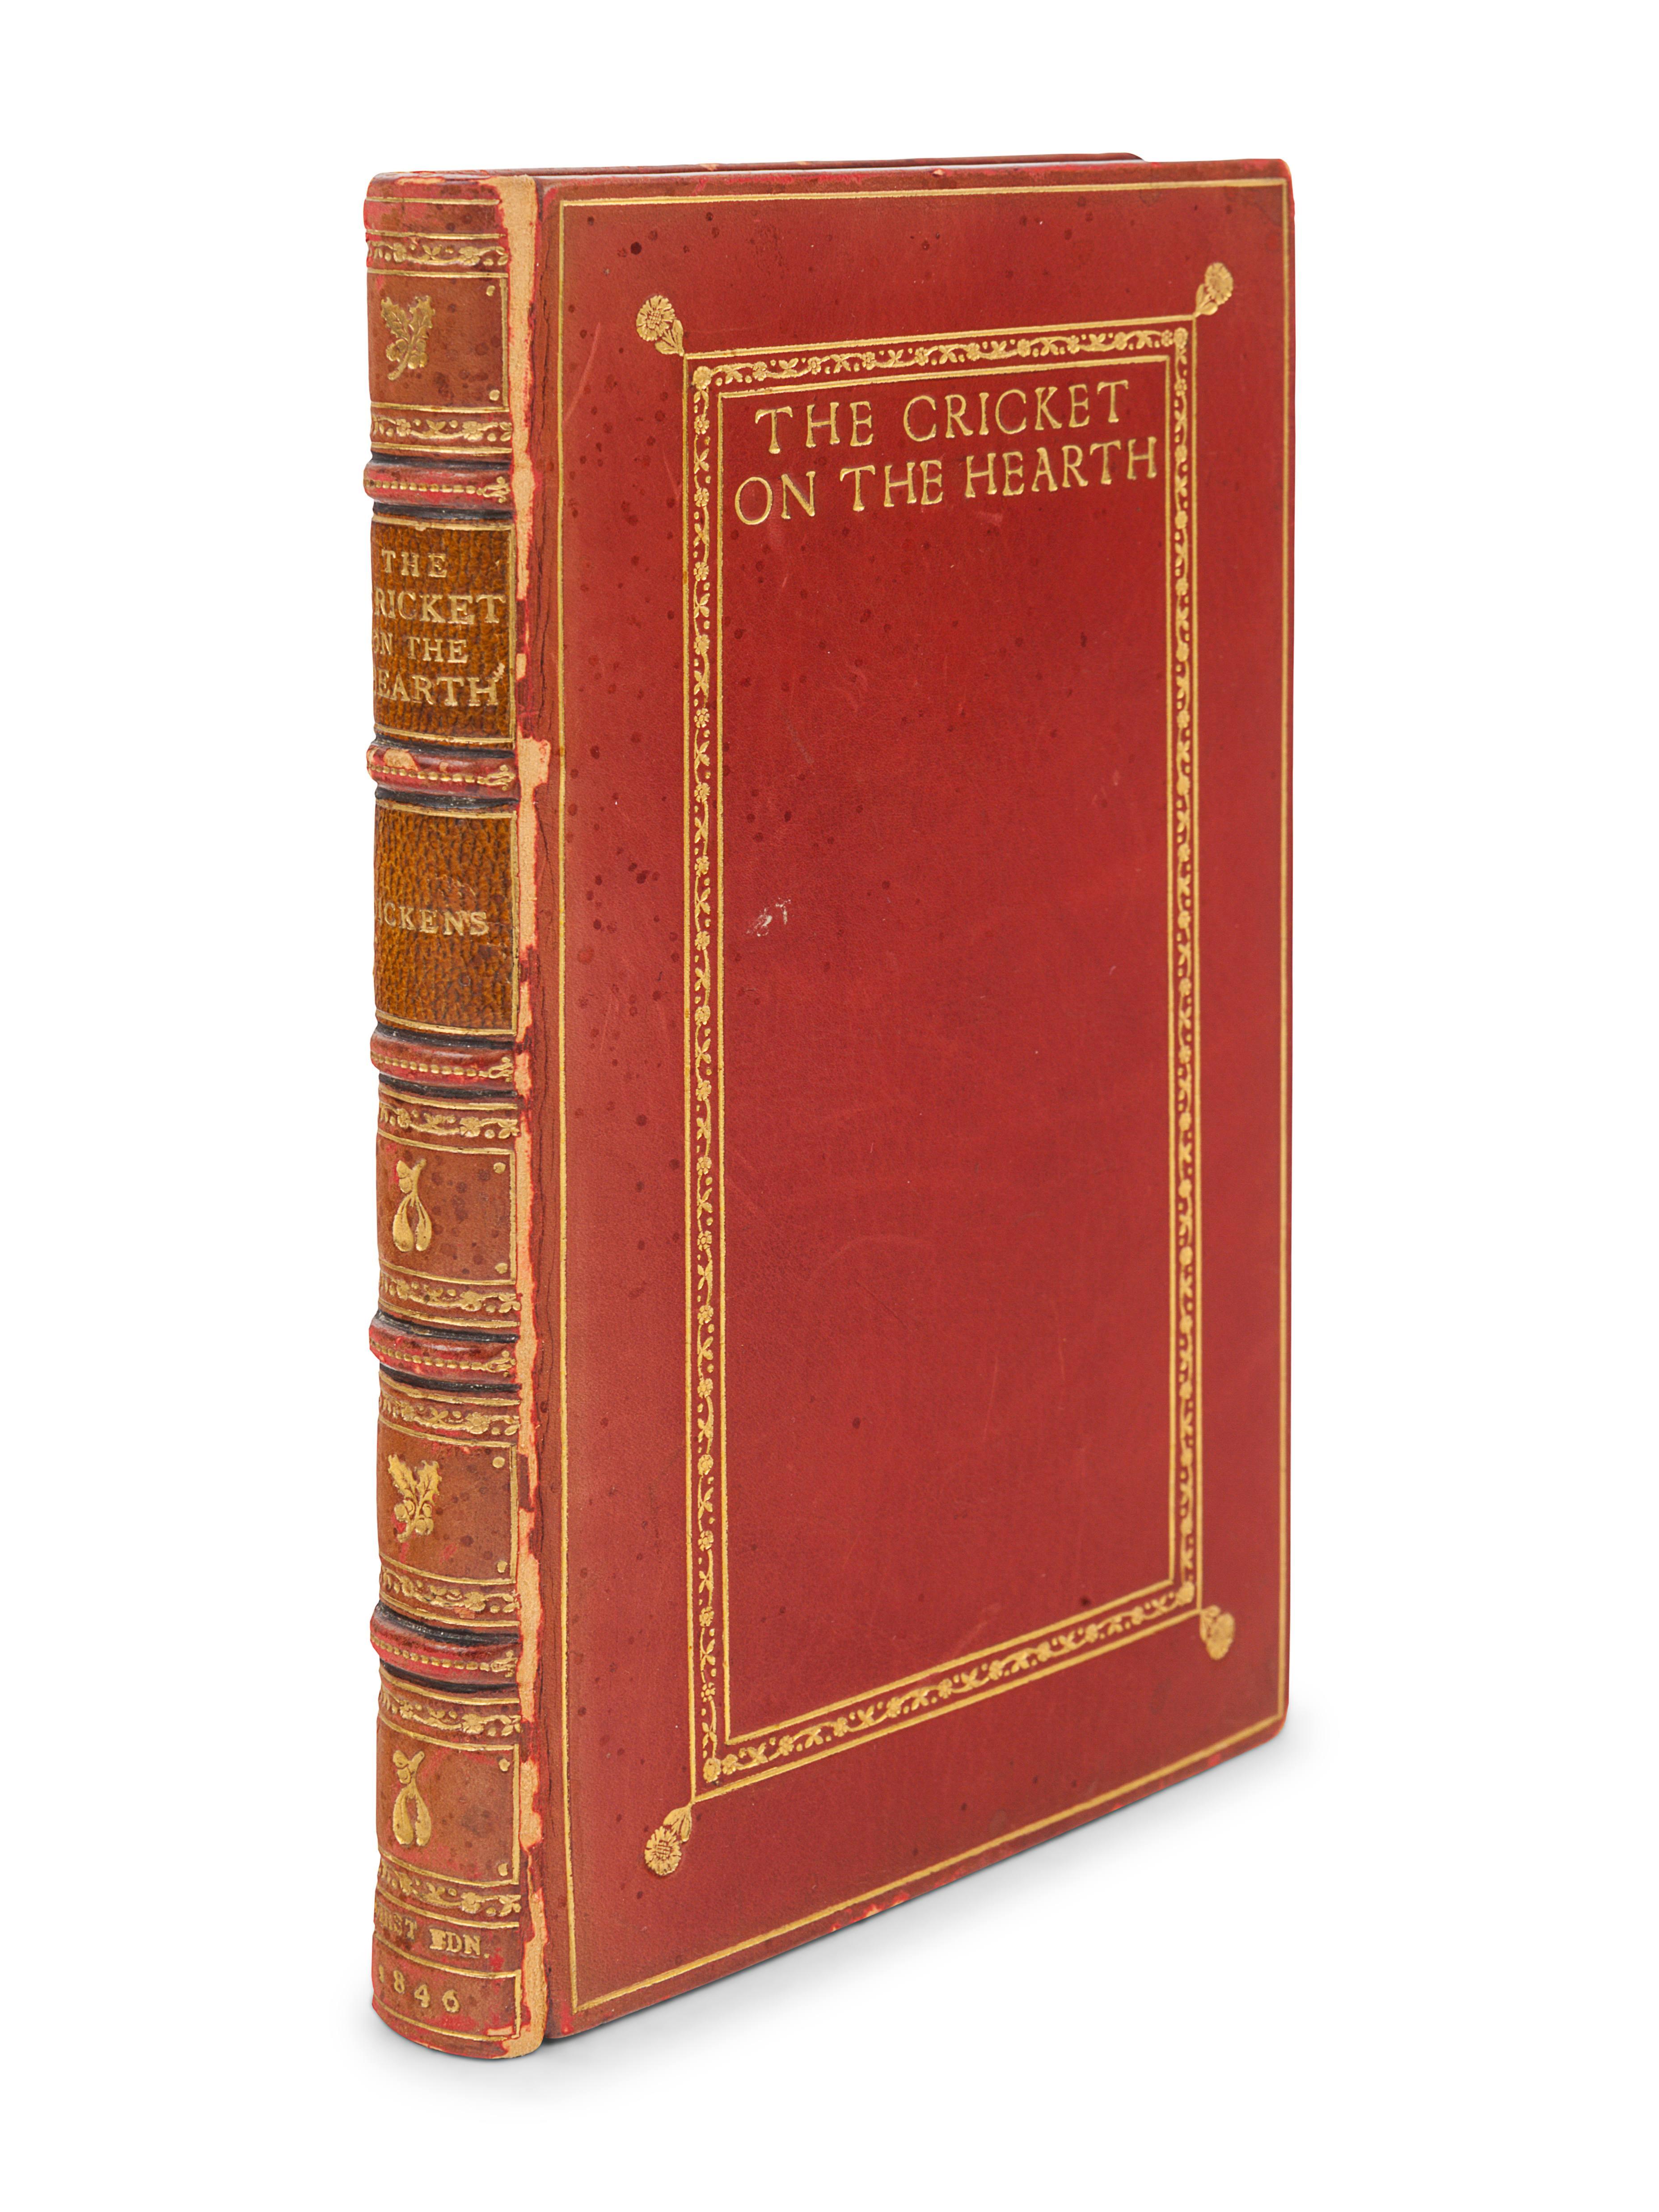 DICKENS, Charles (1812-1870). The Cricket on the Hearth. A Fairy Tale of Home. London: Bradbury & Ev